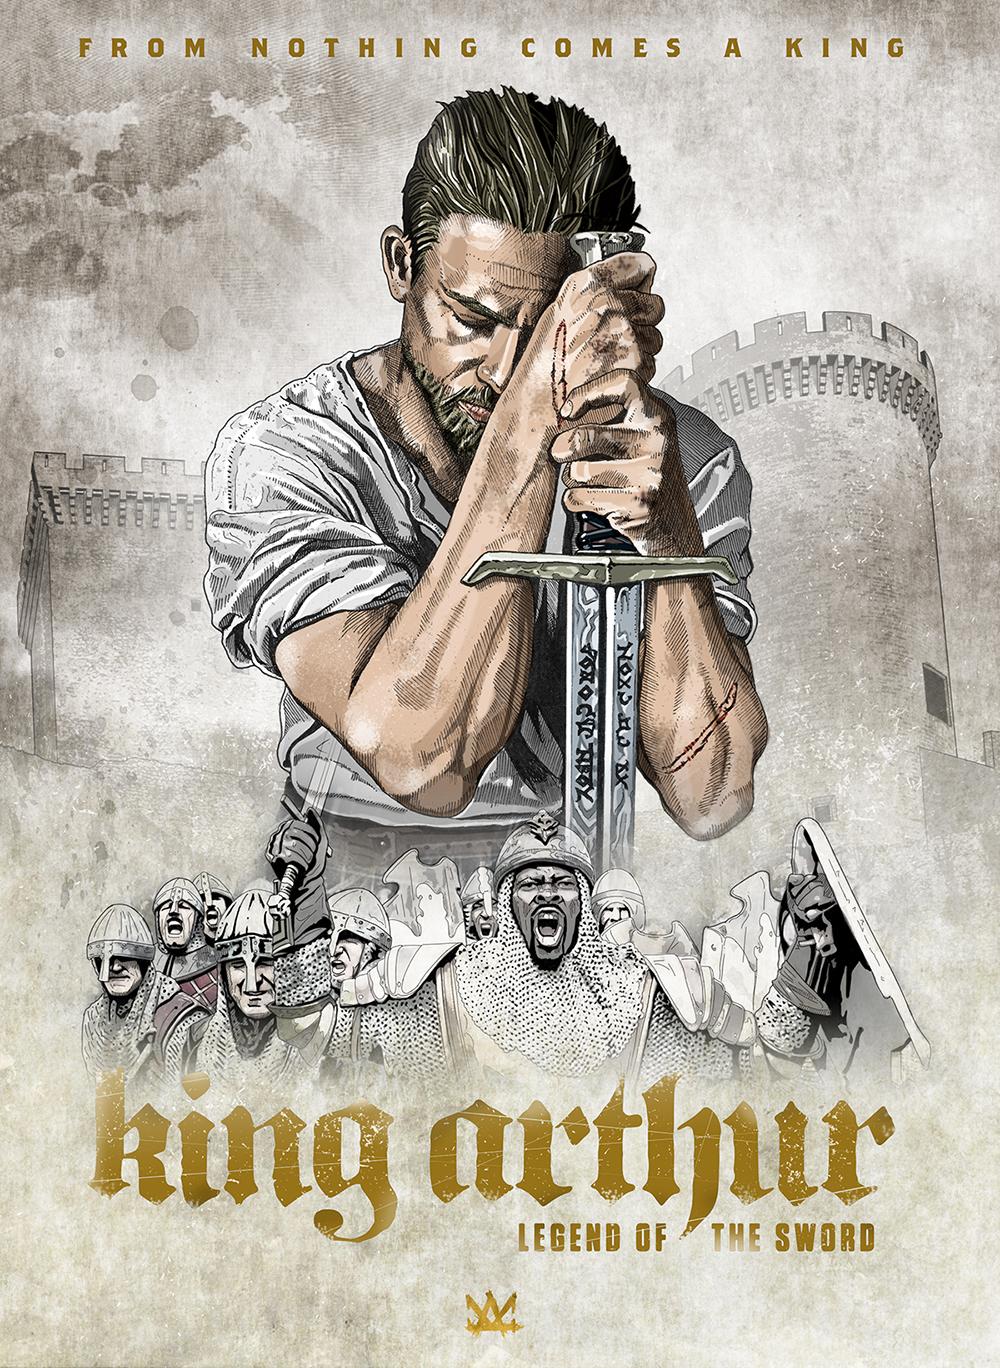 KingArthur_poster_fin_sm.jpg